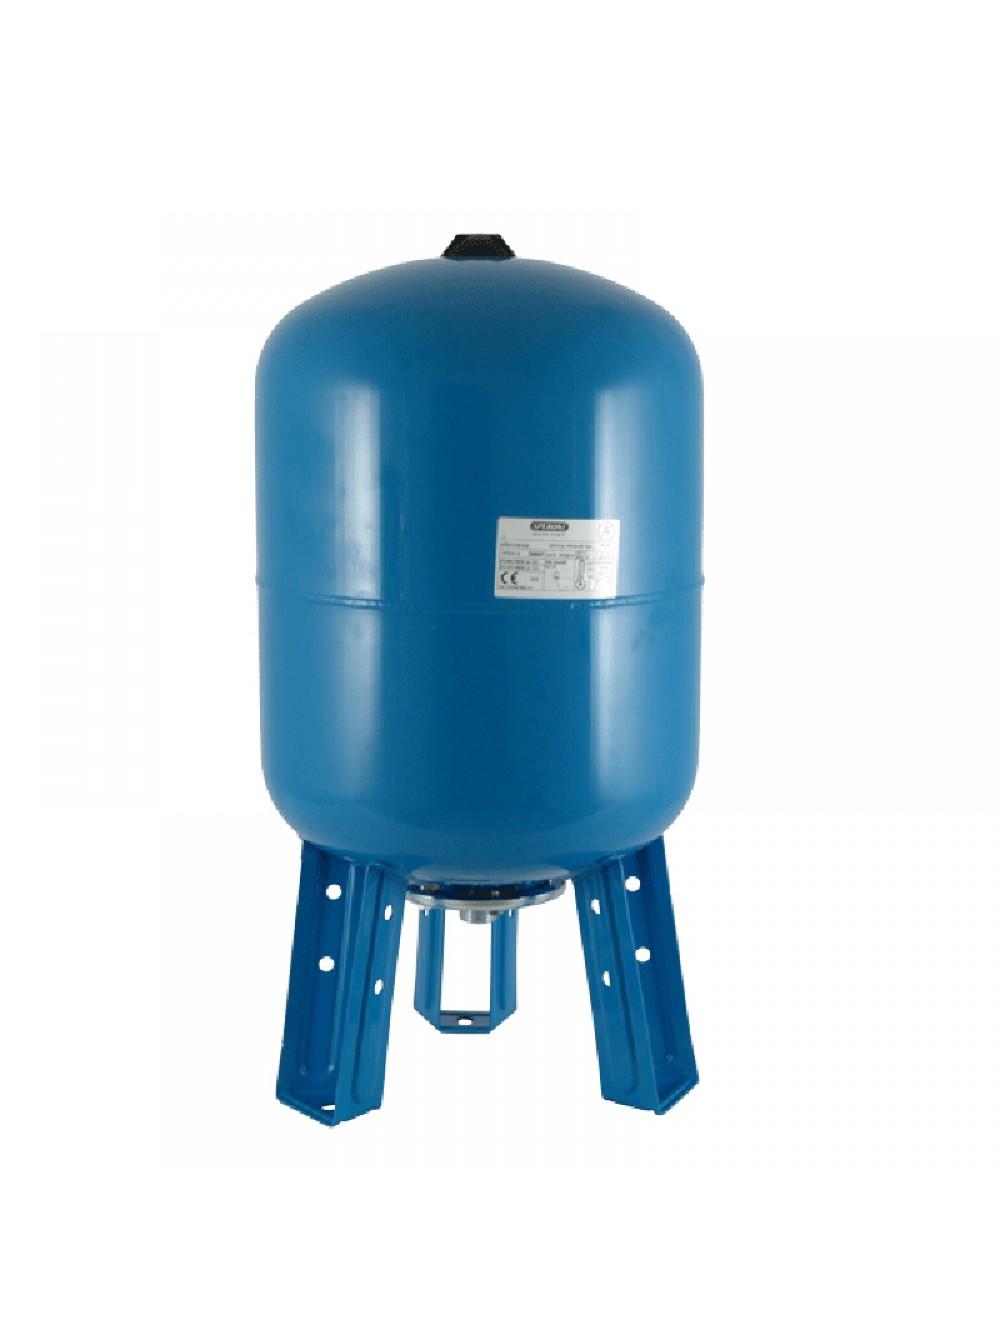 Гидроаккумулятор для воды Imera AV 50 цена